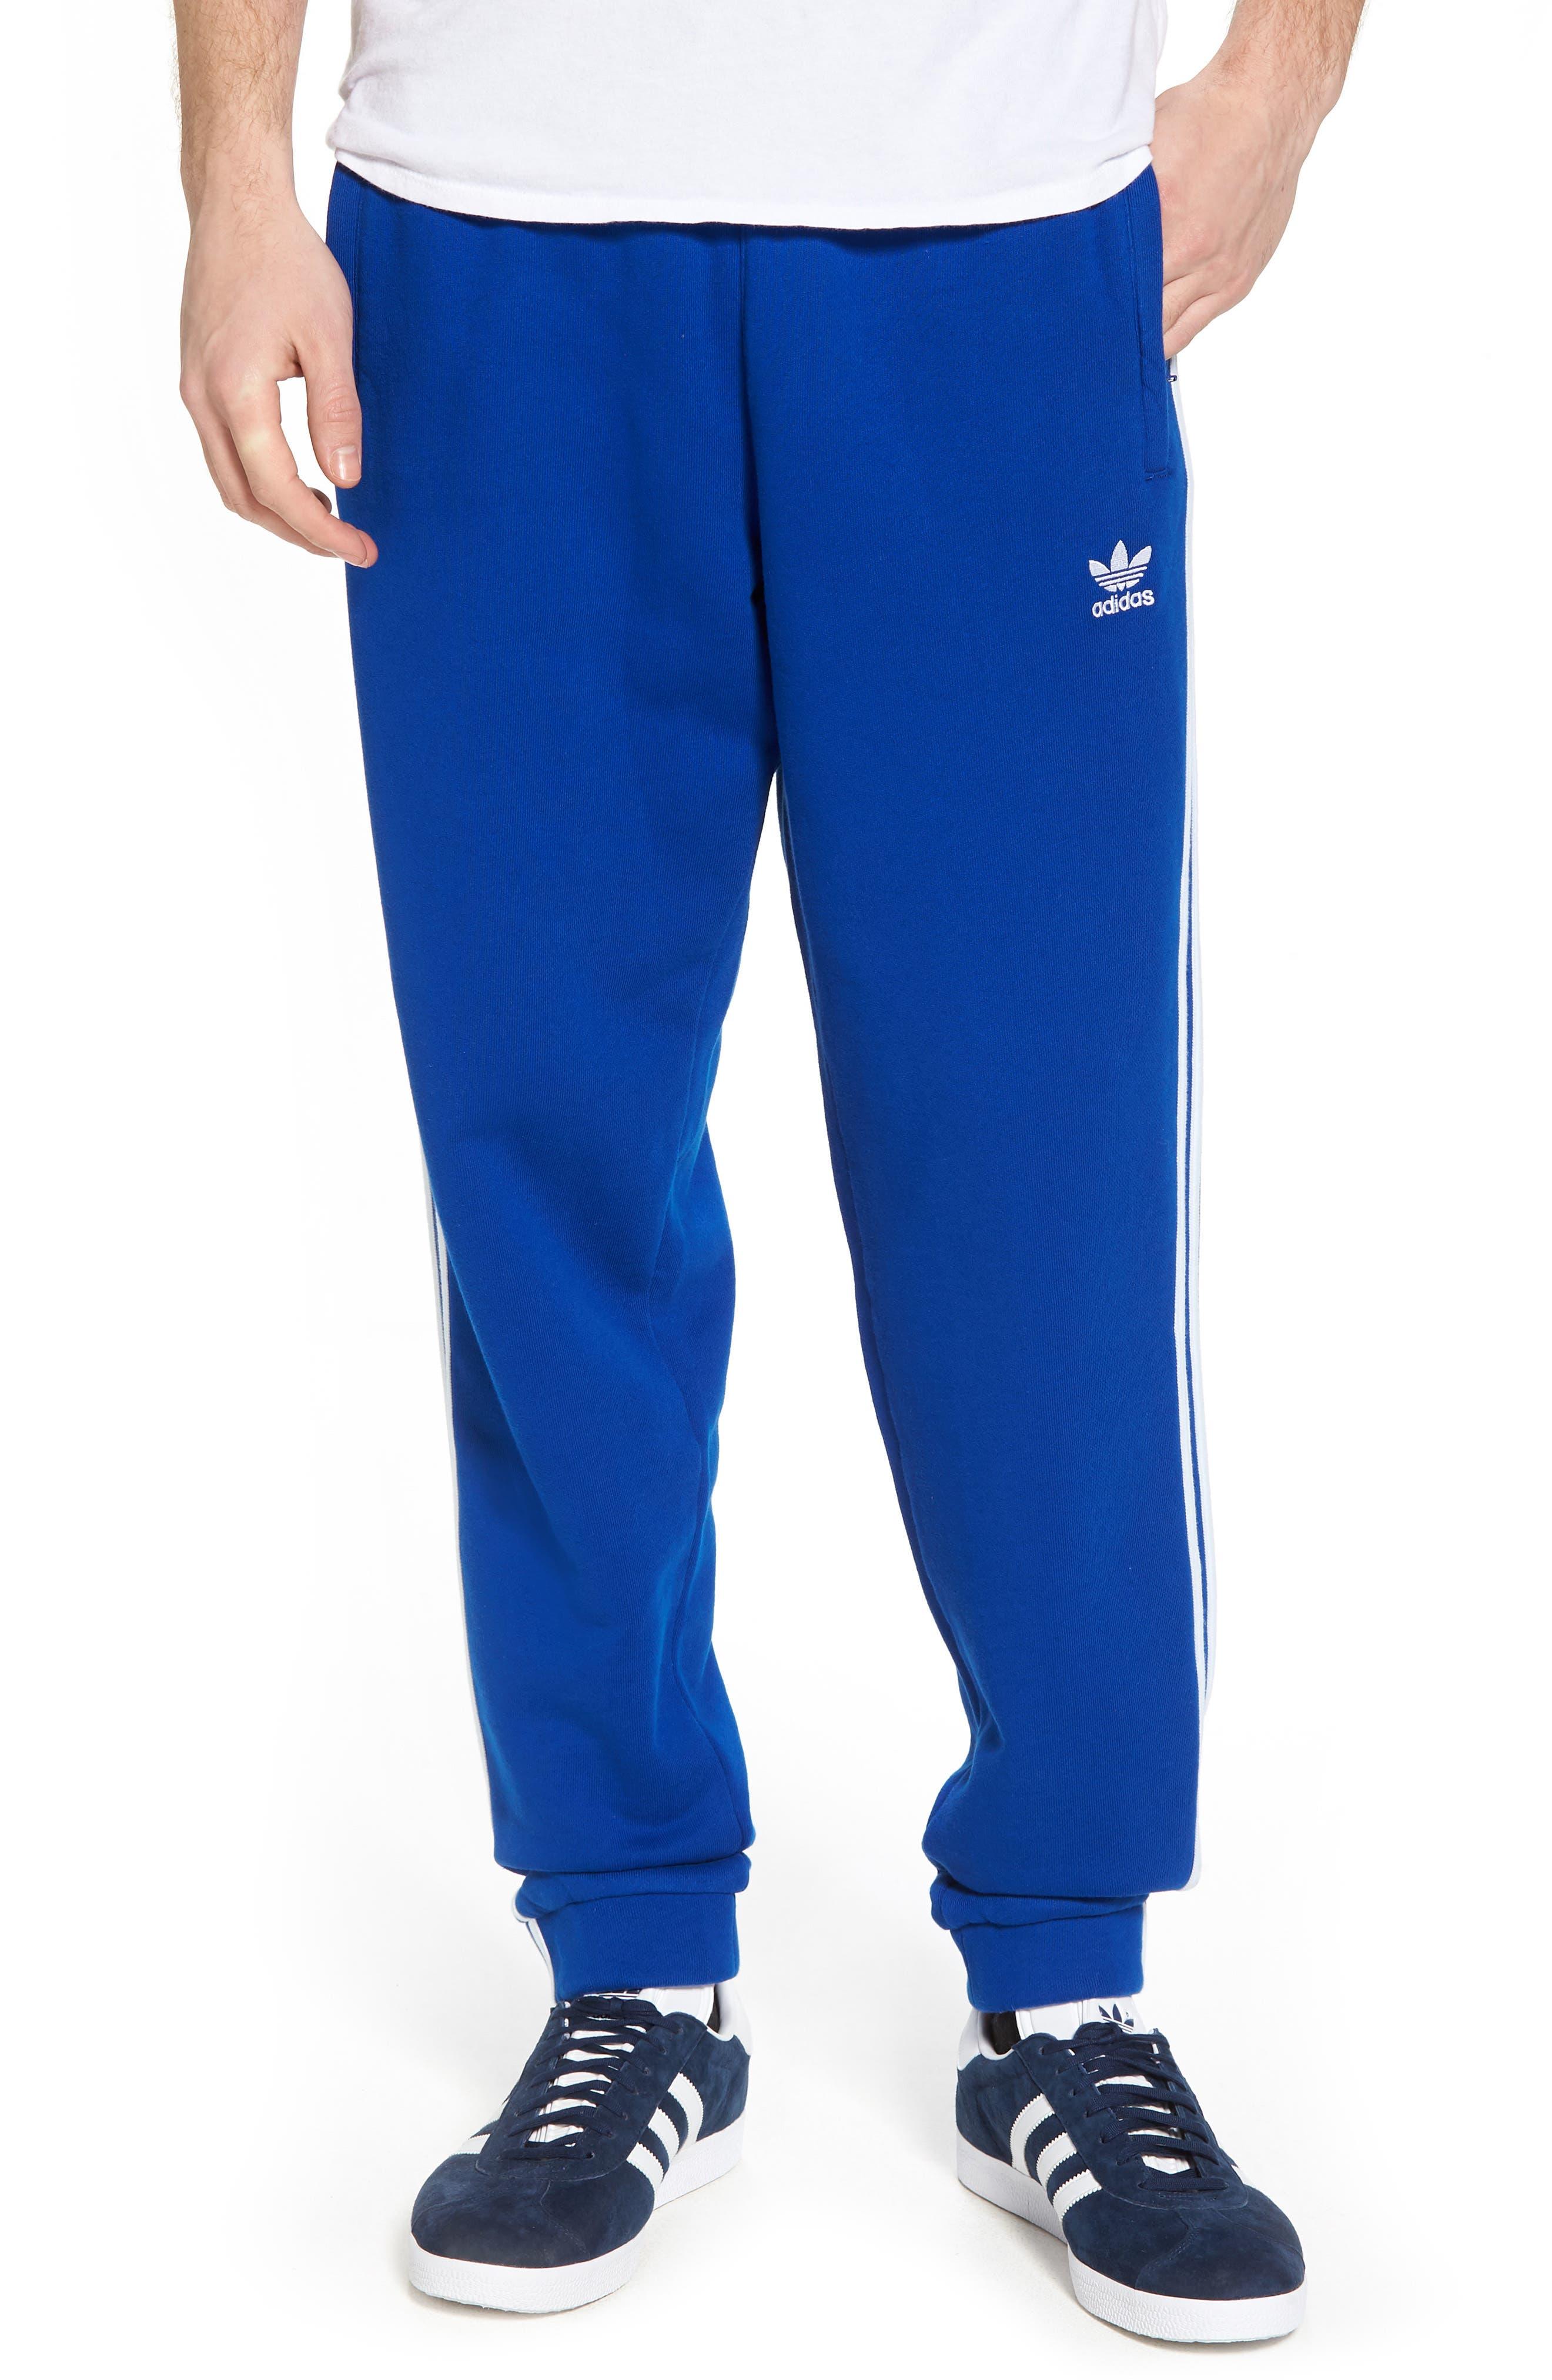 3-Stripes Sweatpants,                         Main,                         color, Collegiate Royal